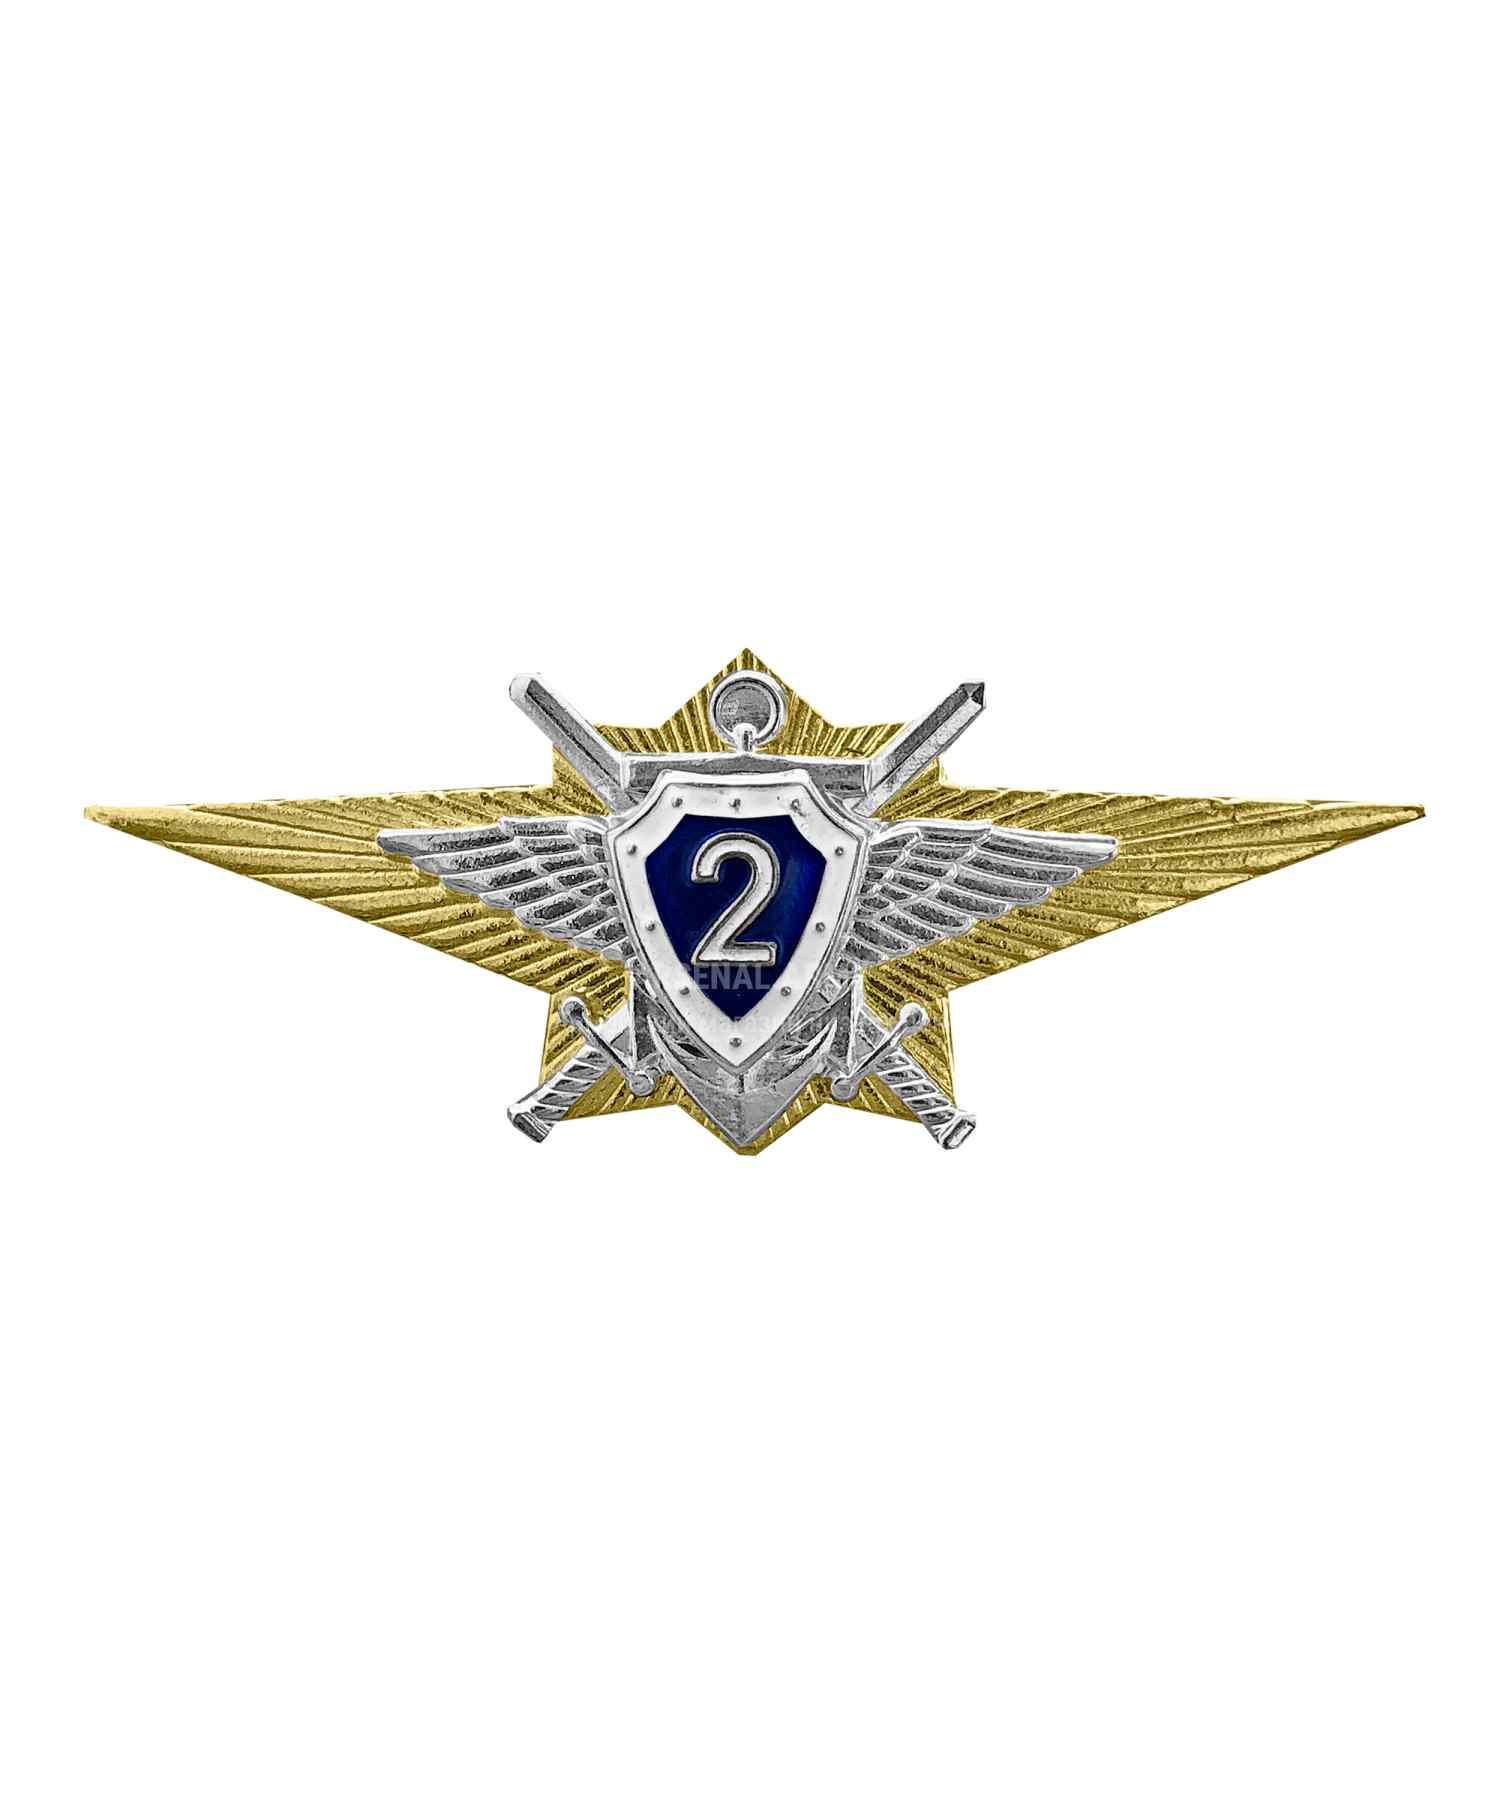 Значки классности РА офицерского состава